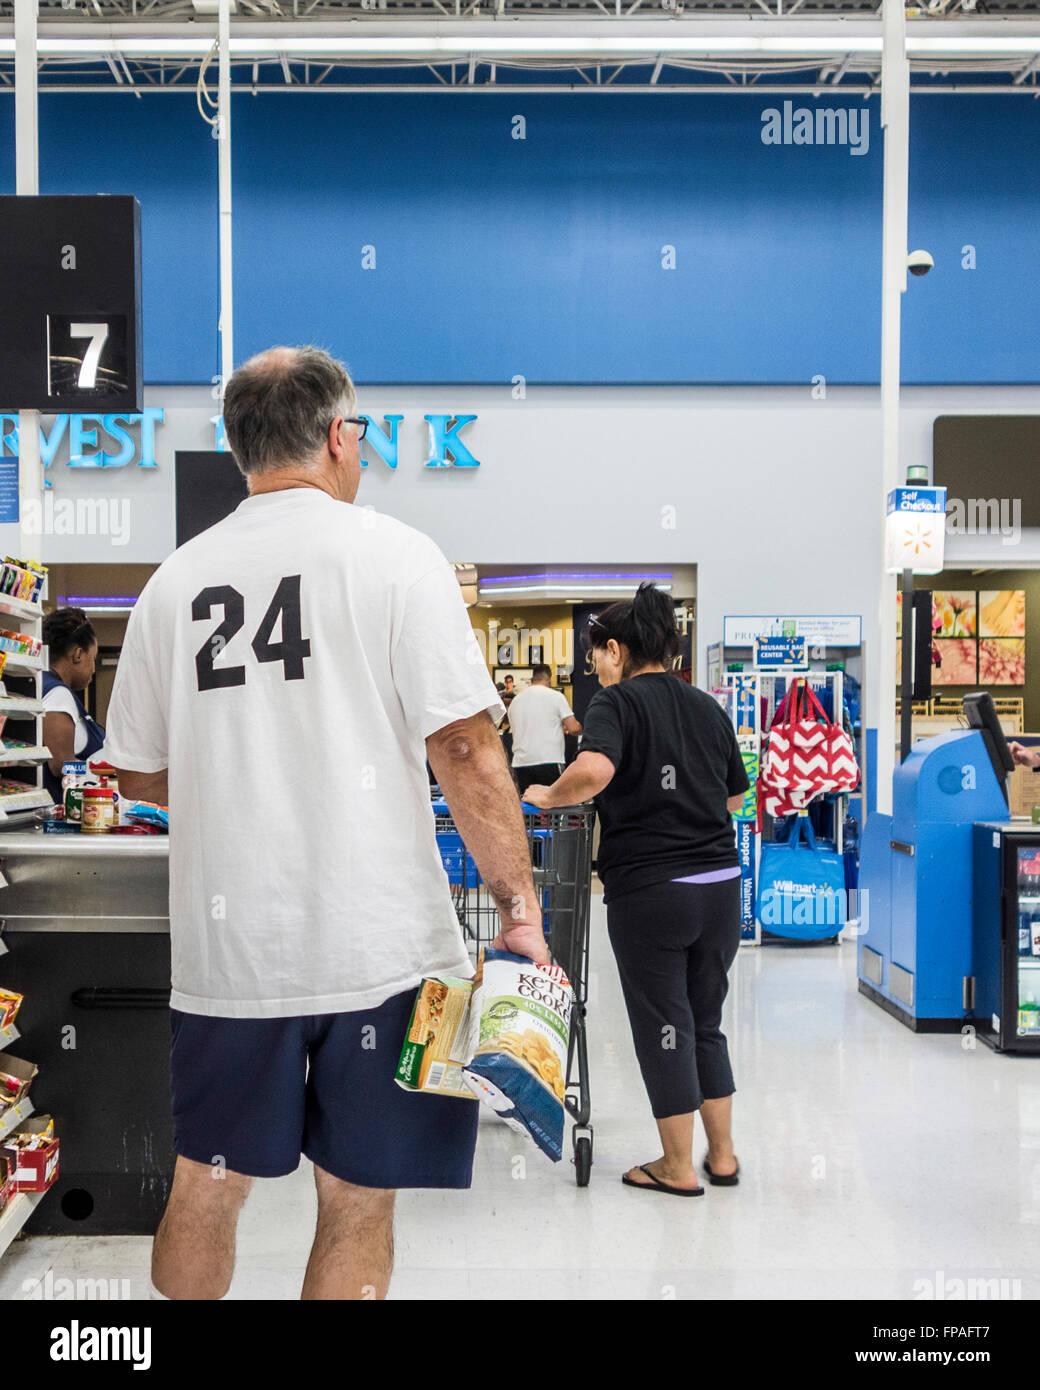 Walmart Discount Store Stockfotos & Walmart Discount Store Bilder ...